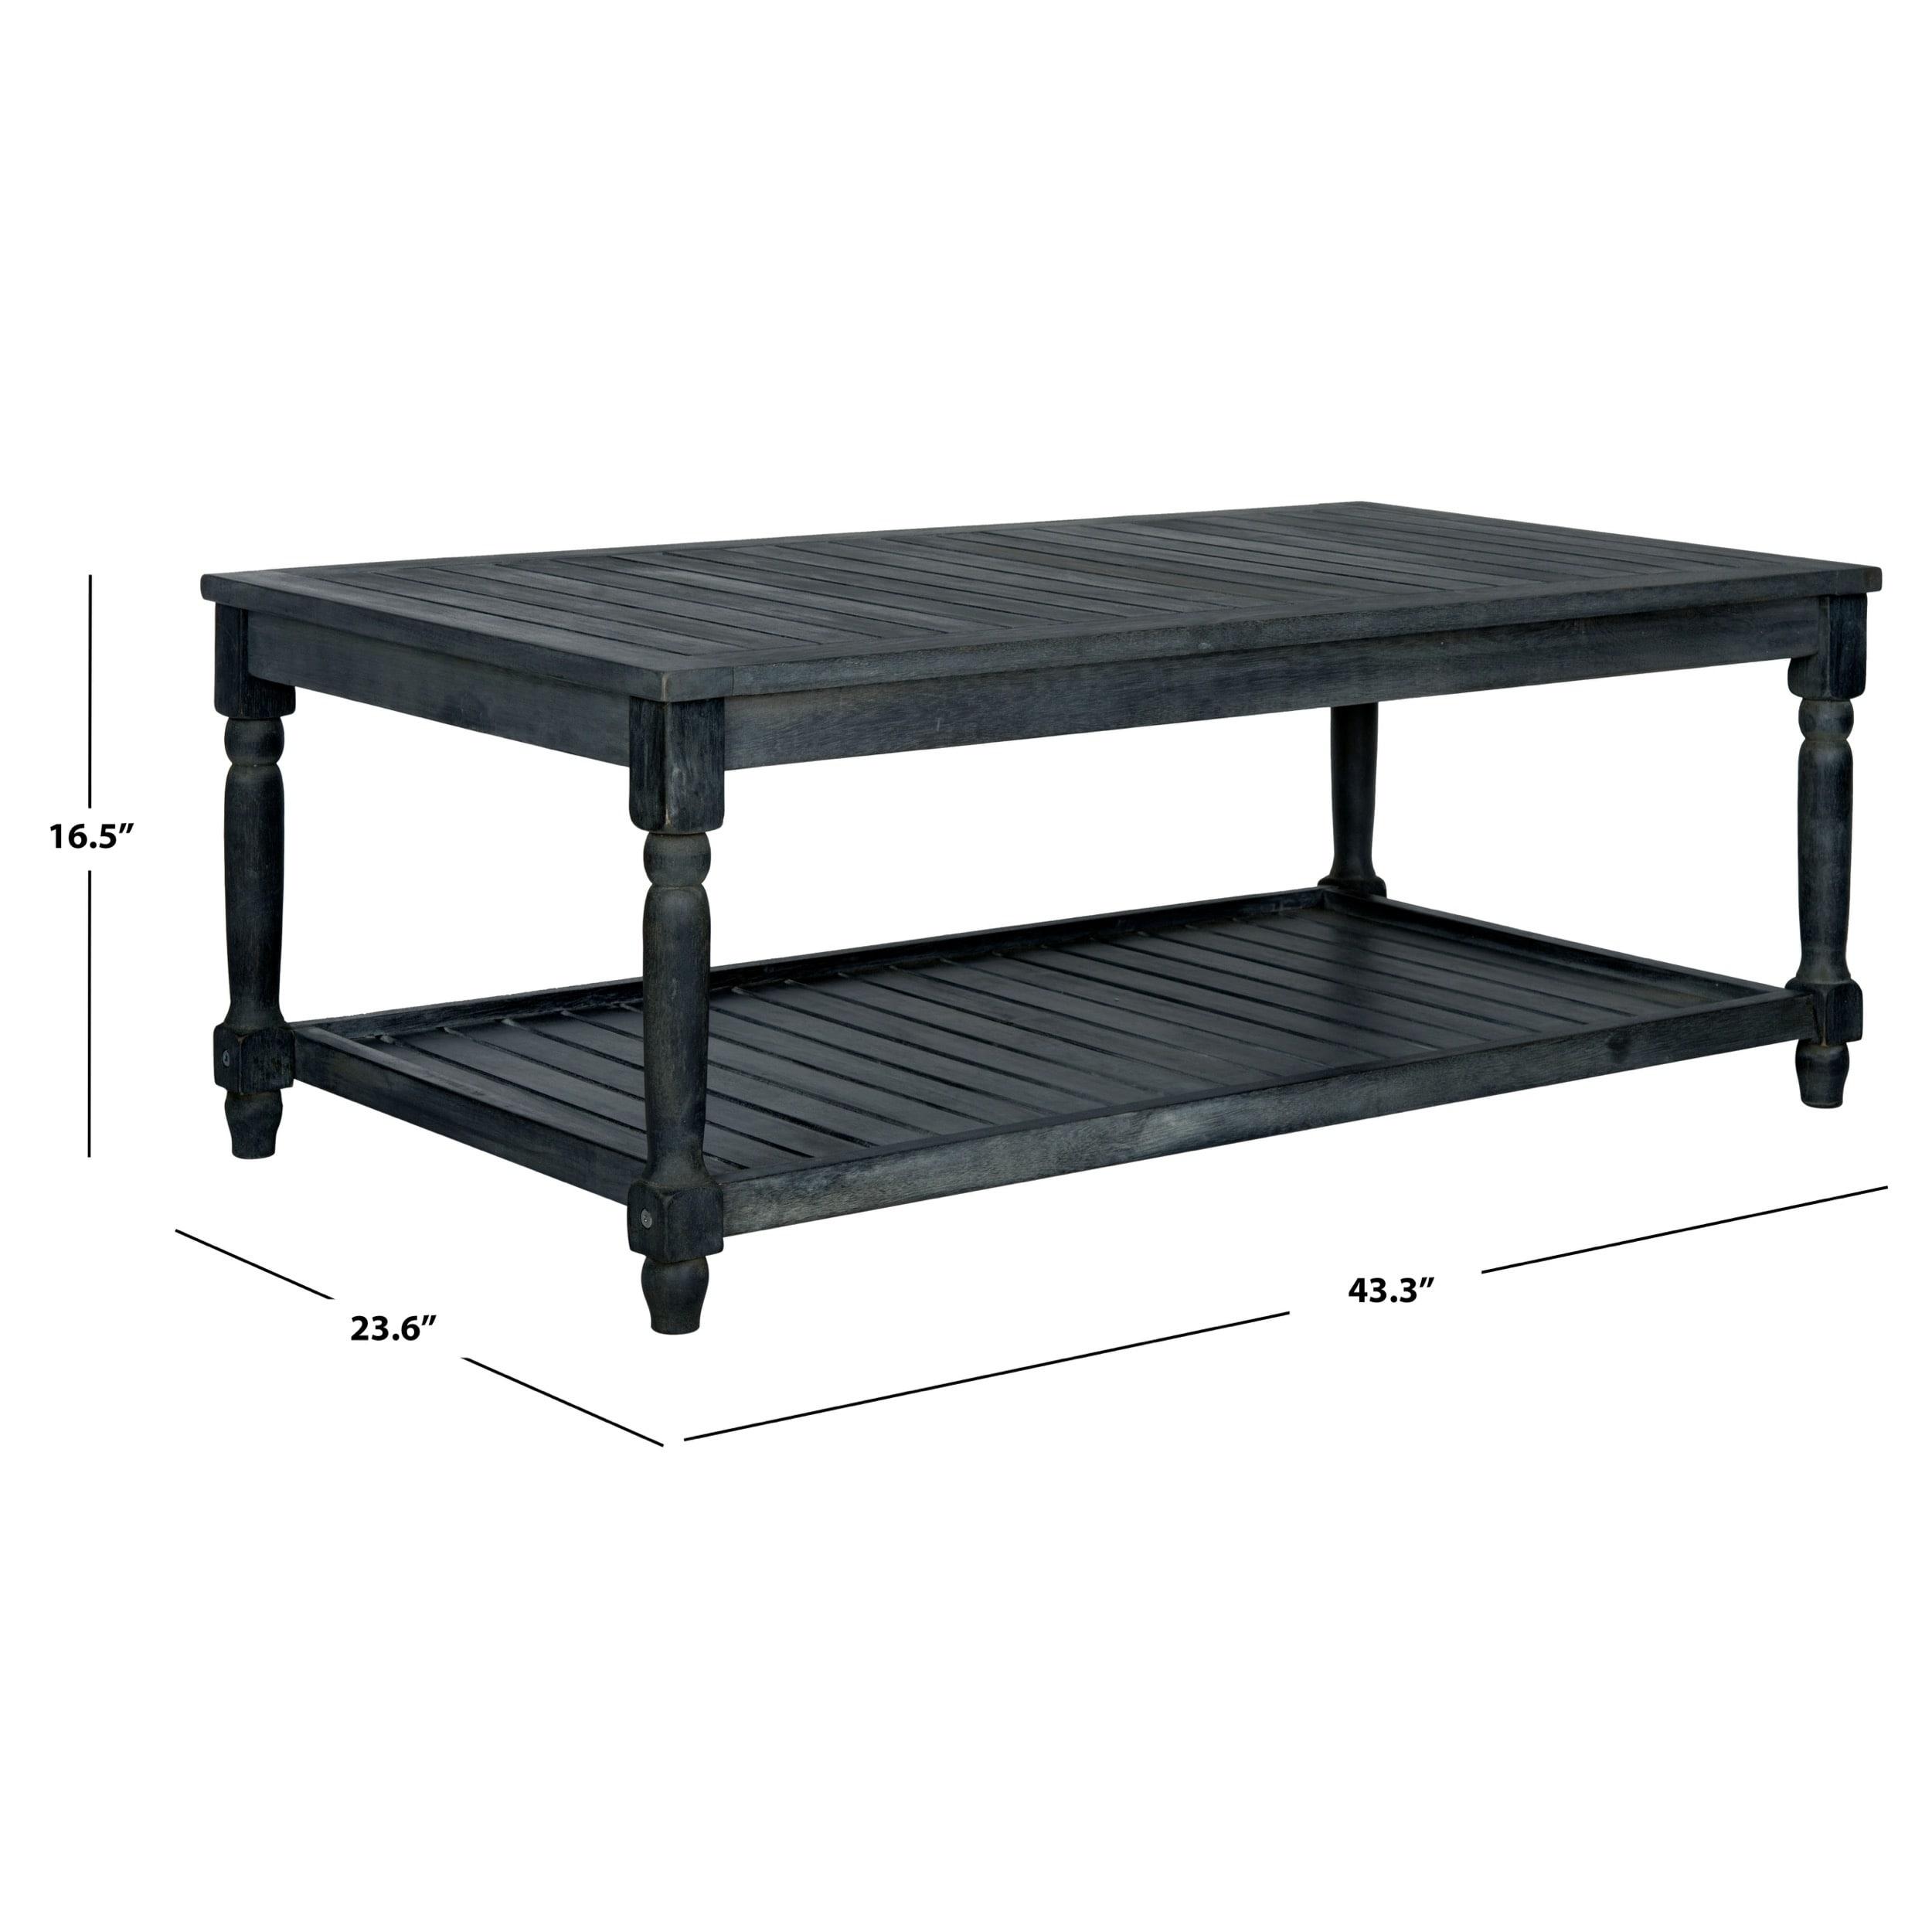 Magnificent Safavieh Oakley Dark Slate Grey Coffee Table 43 3 X 23 6 X 16 5 Machost Co Dining Chair Design Ideas Machostcouk